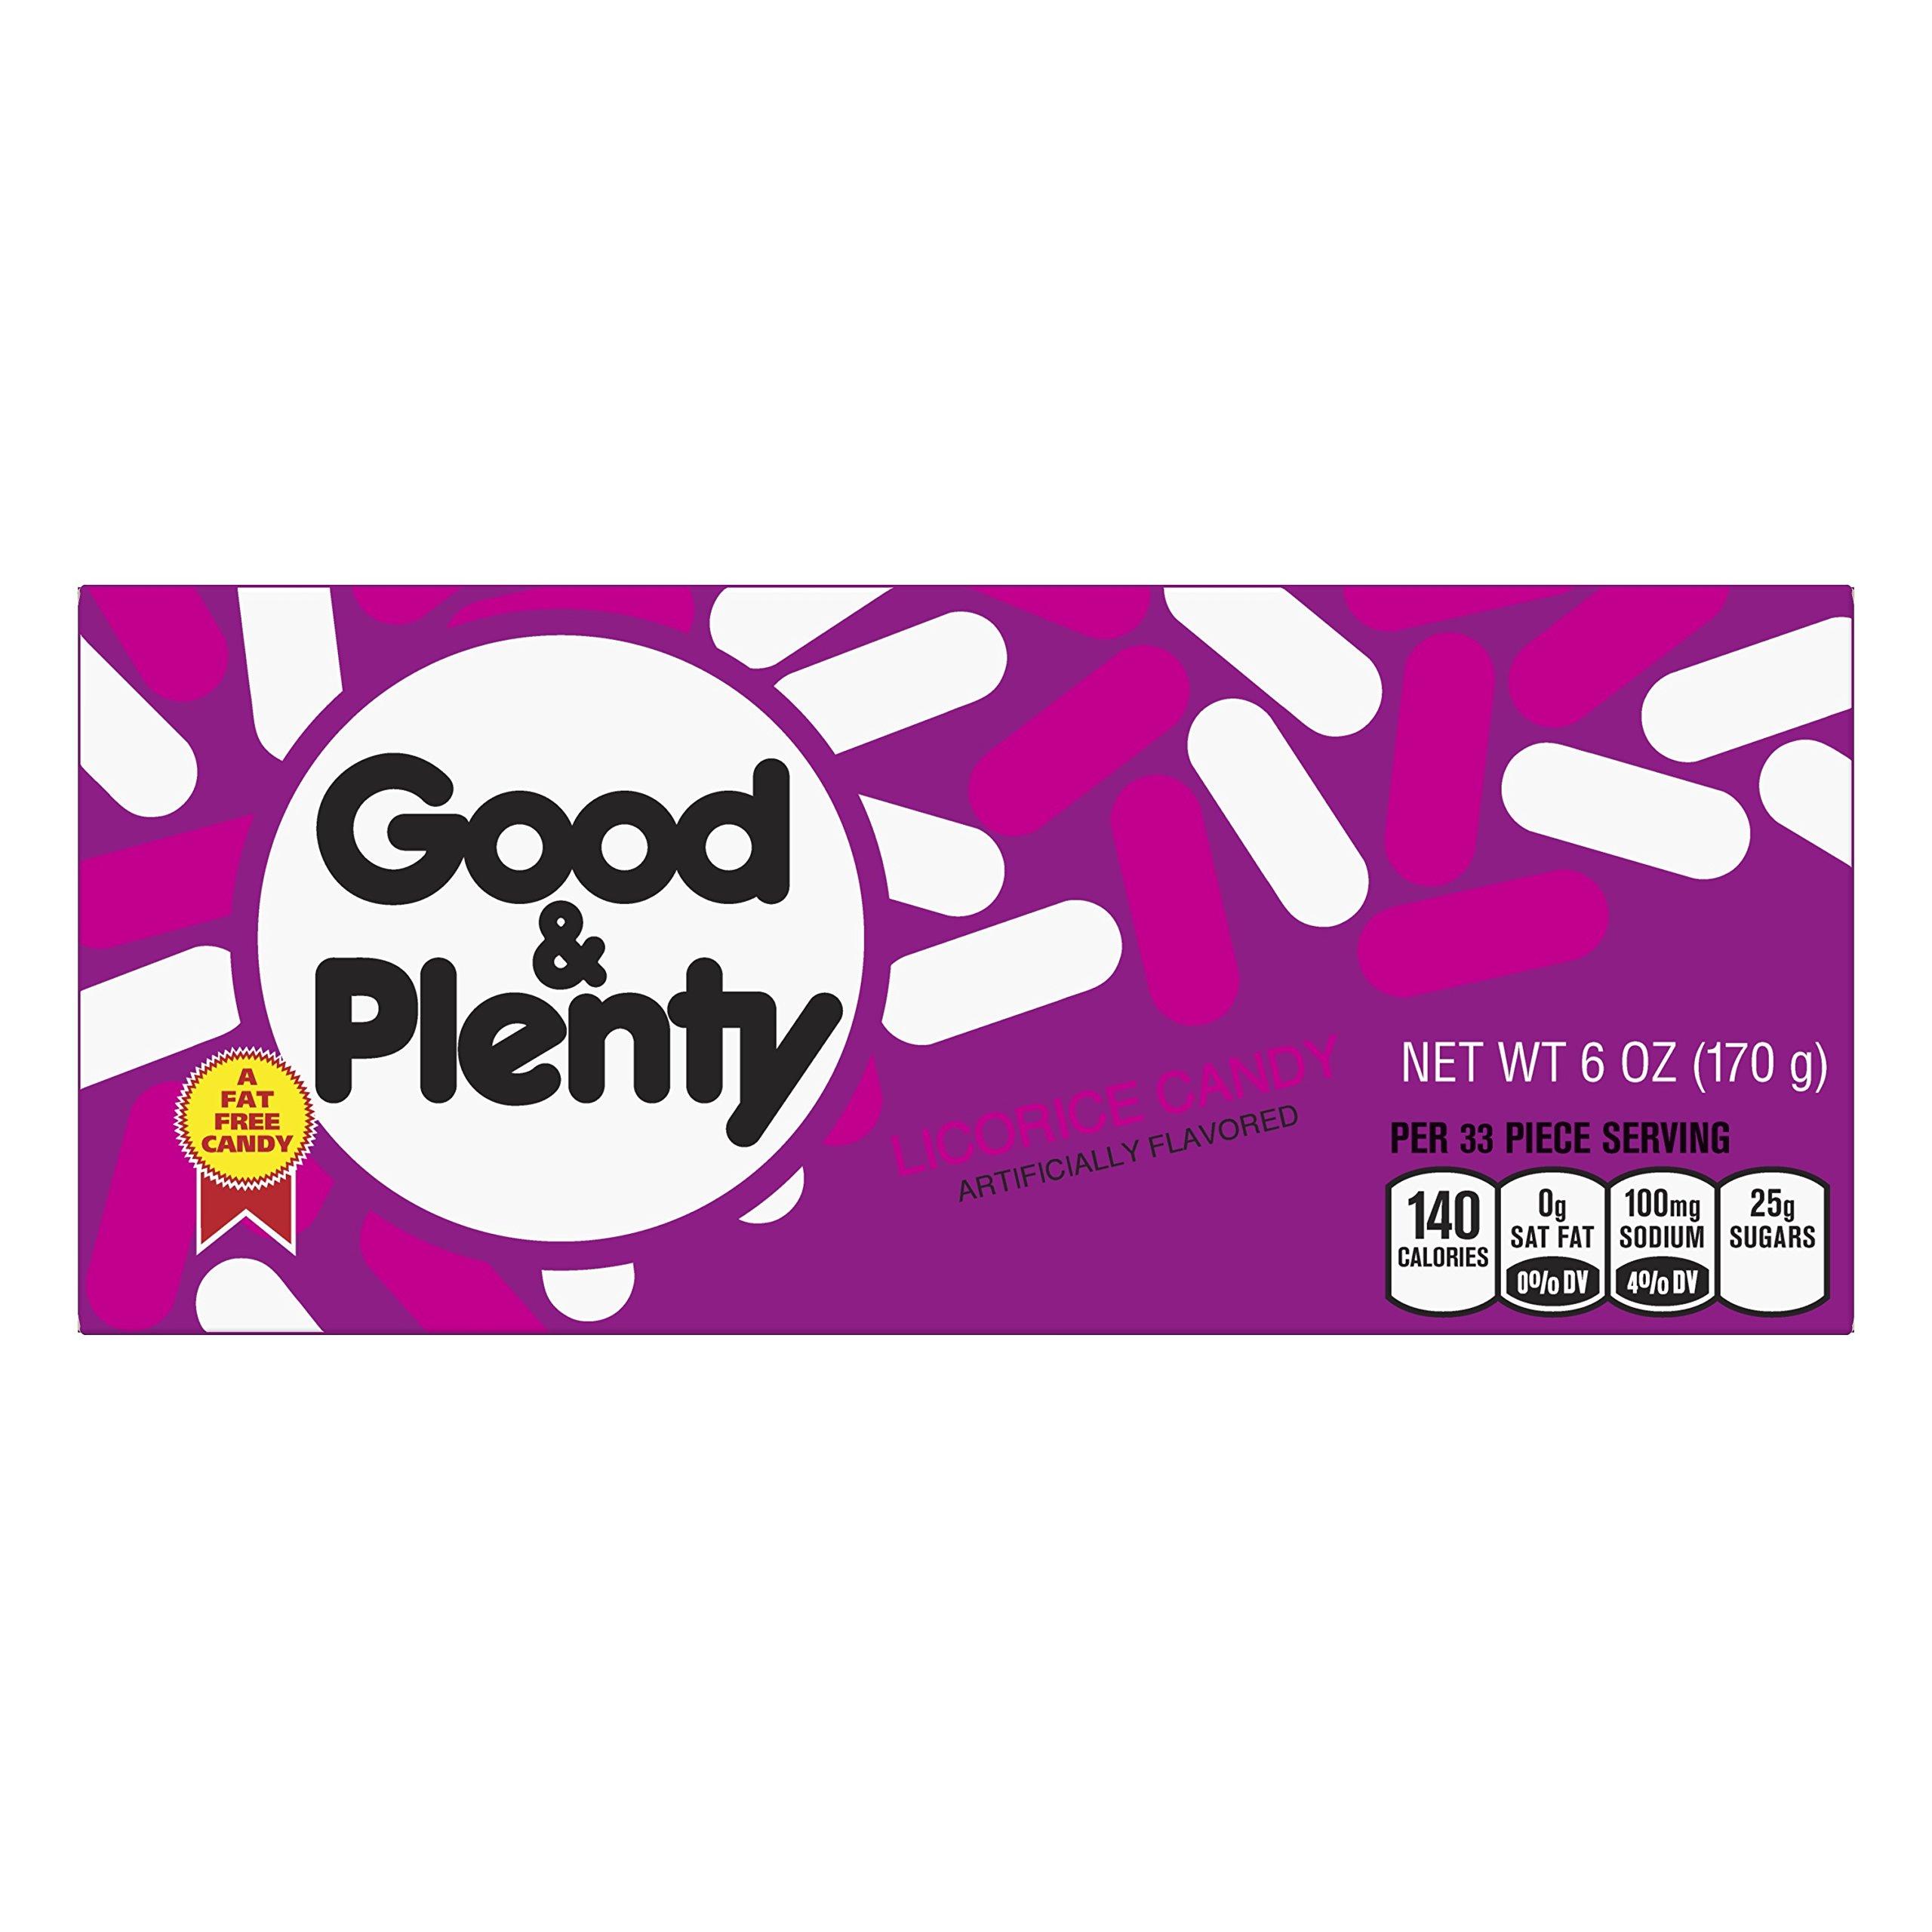 GOOD & PLENTY Licorice Candy, 6 Ounce Box